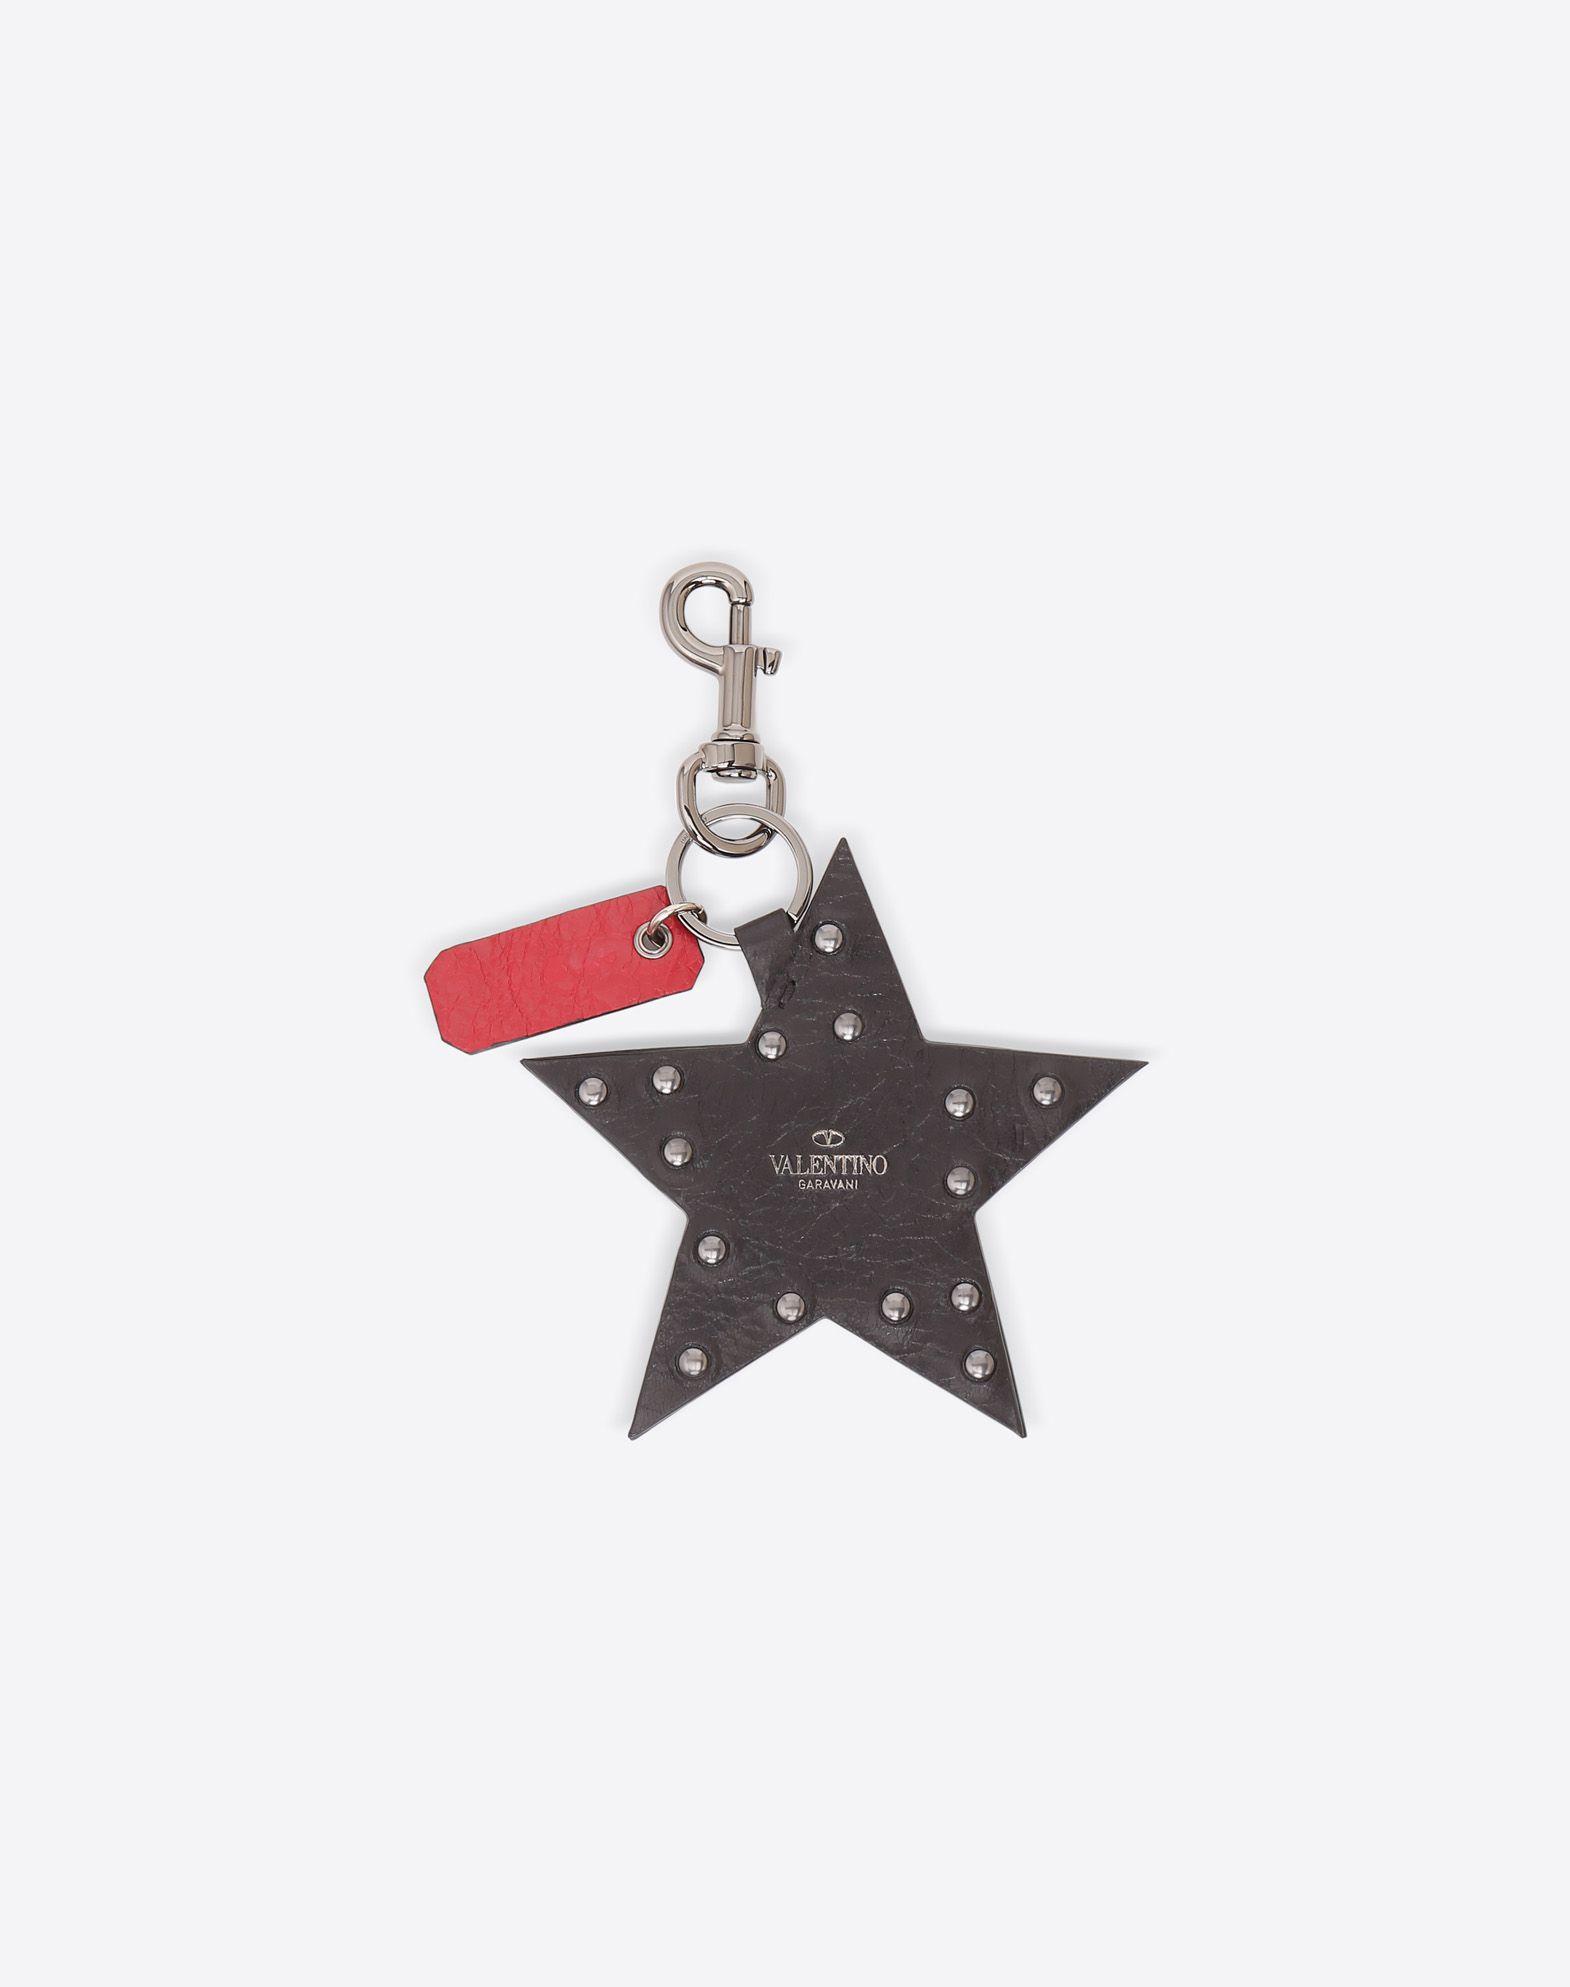 VALENTINO Rockstud Spike Star Keyring CHARMS D r